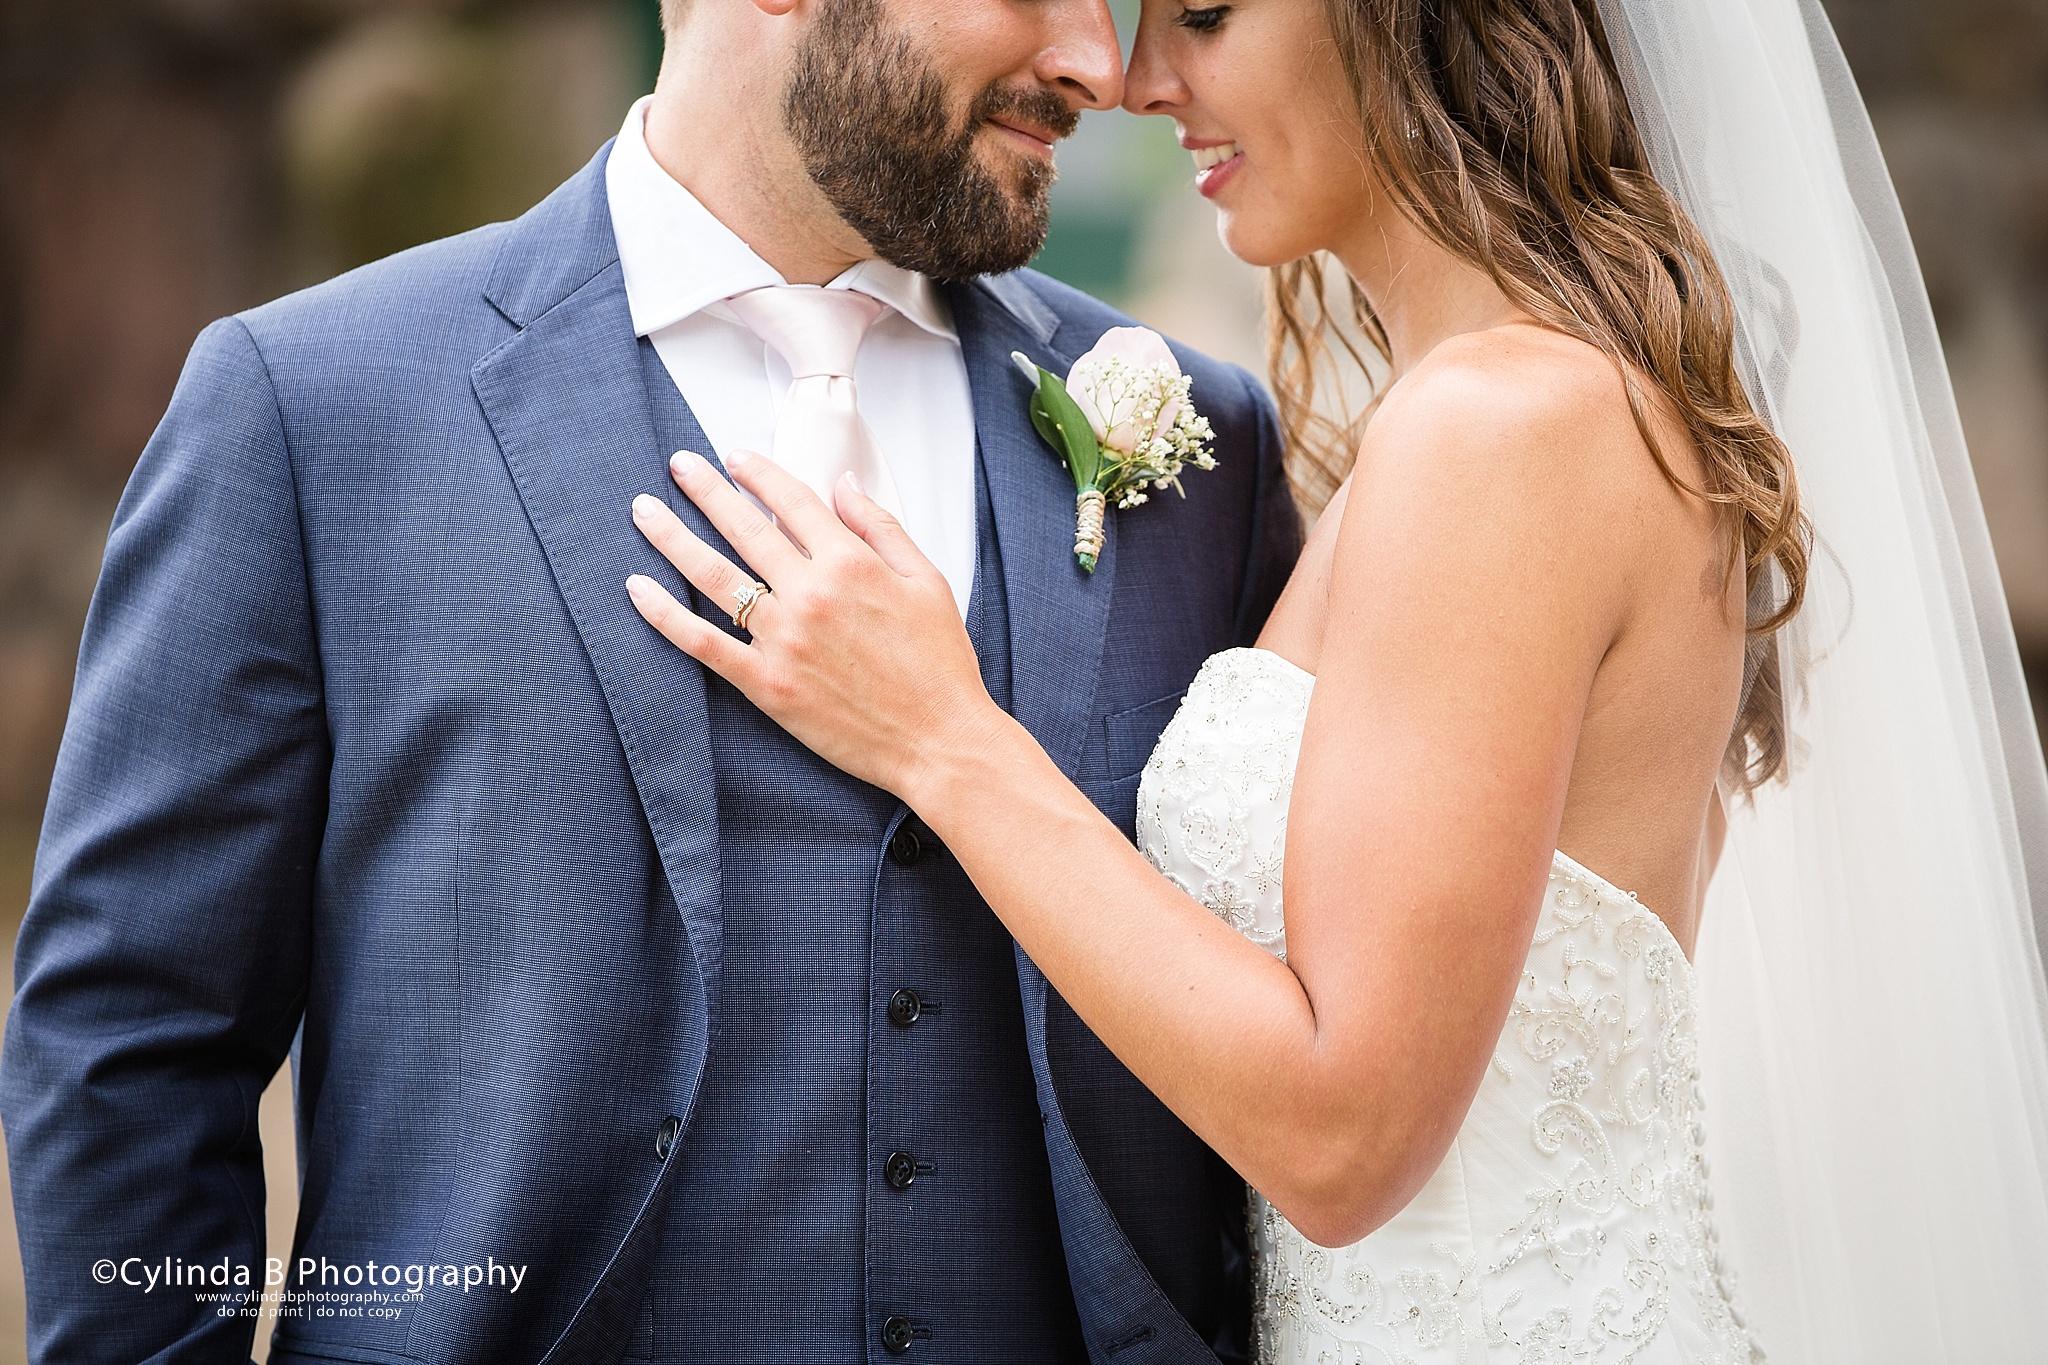 Boldt Castle Wedding, Alexandria Bay, Wedding, Photograper, Cylinda B Photography-40